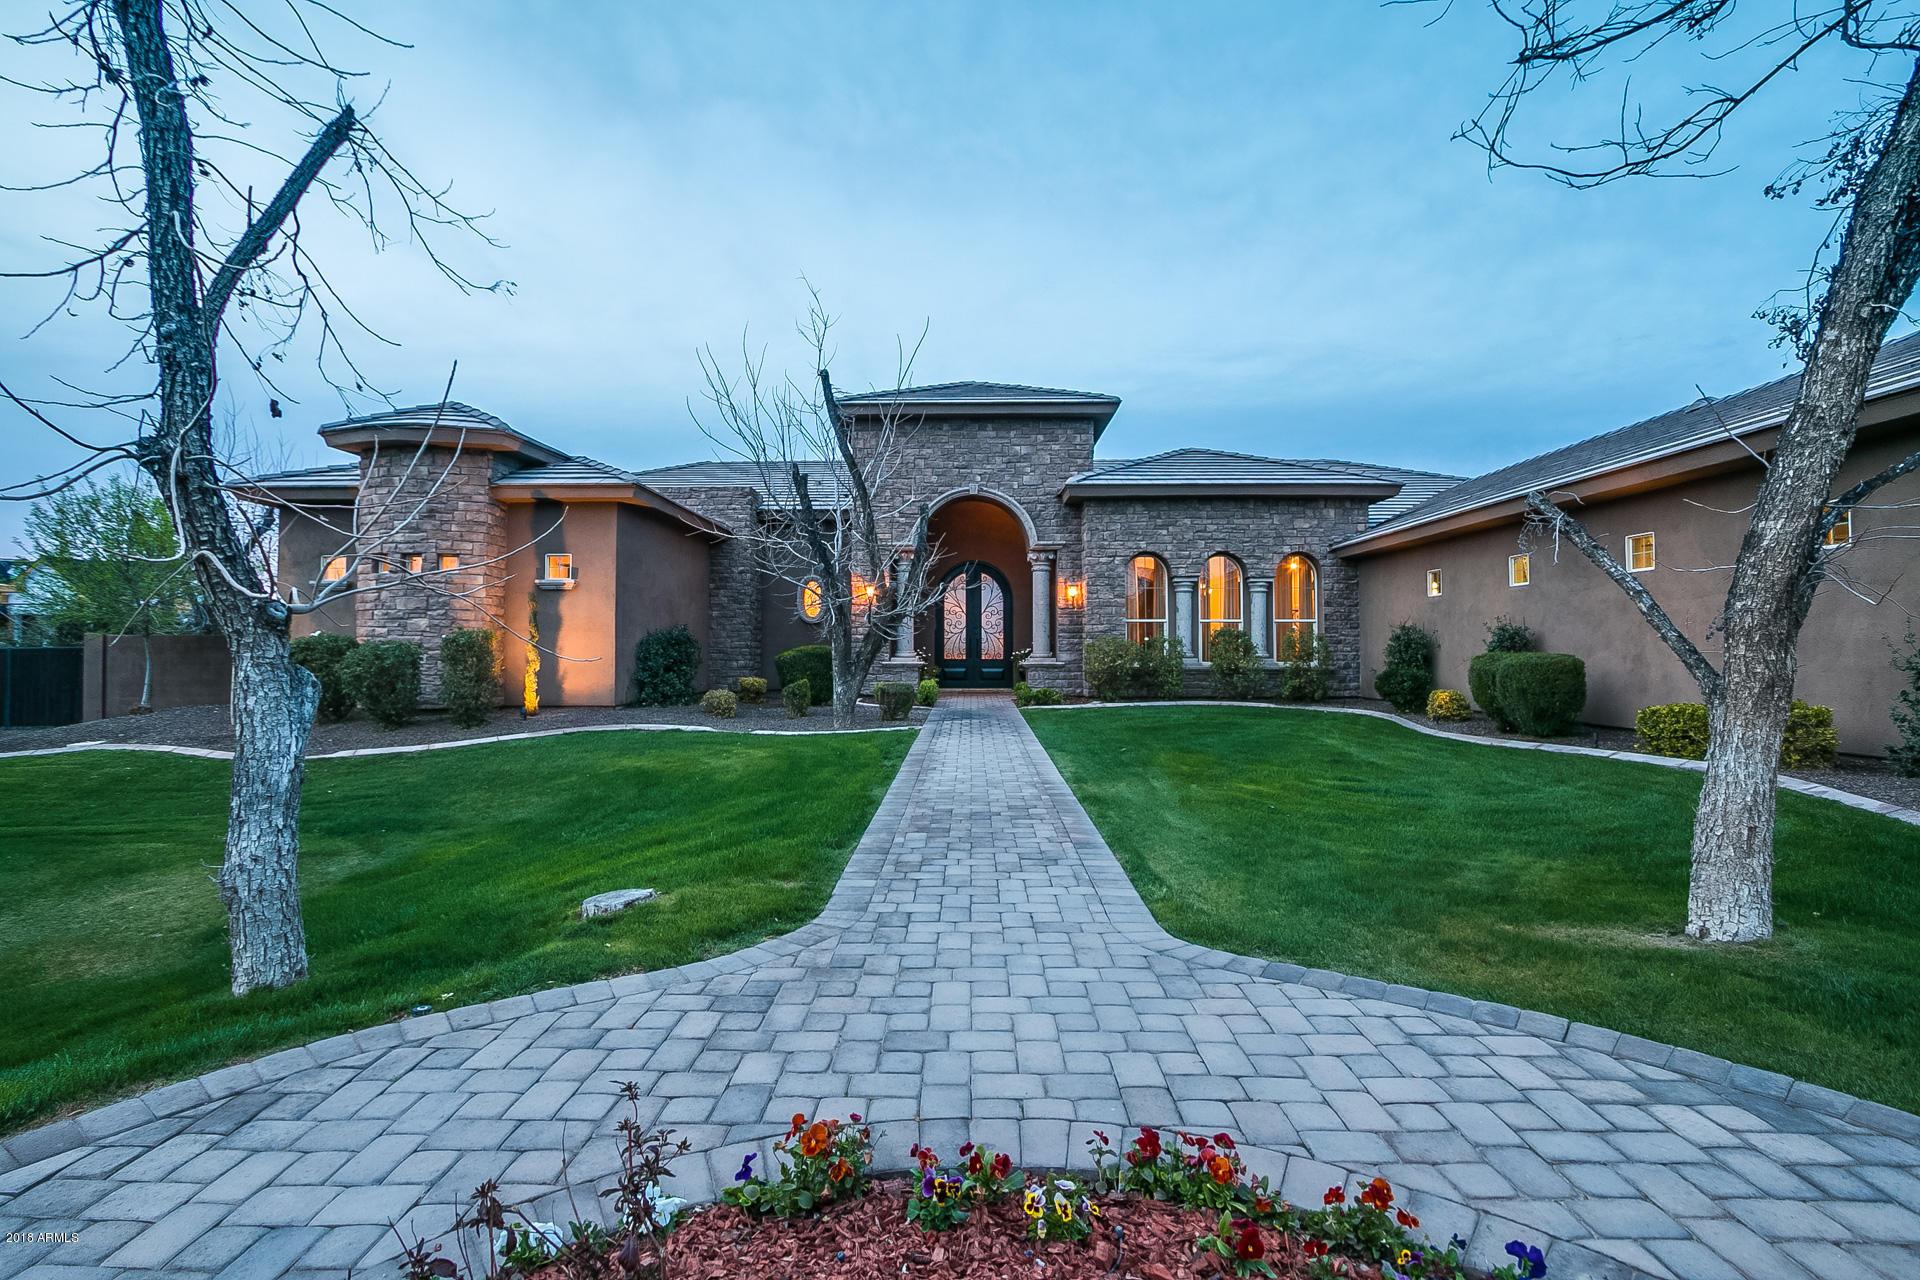 MLS 5821678 20668 E SUNSET Drive, Queen Creek, AZ 85142 Queen Creek AZ Private Pool